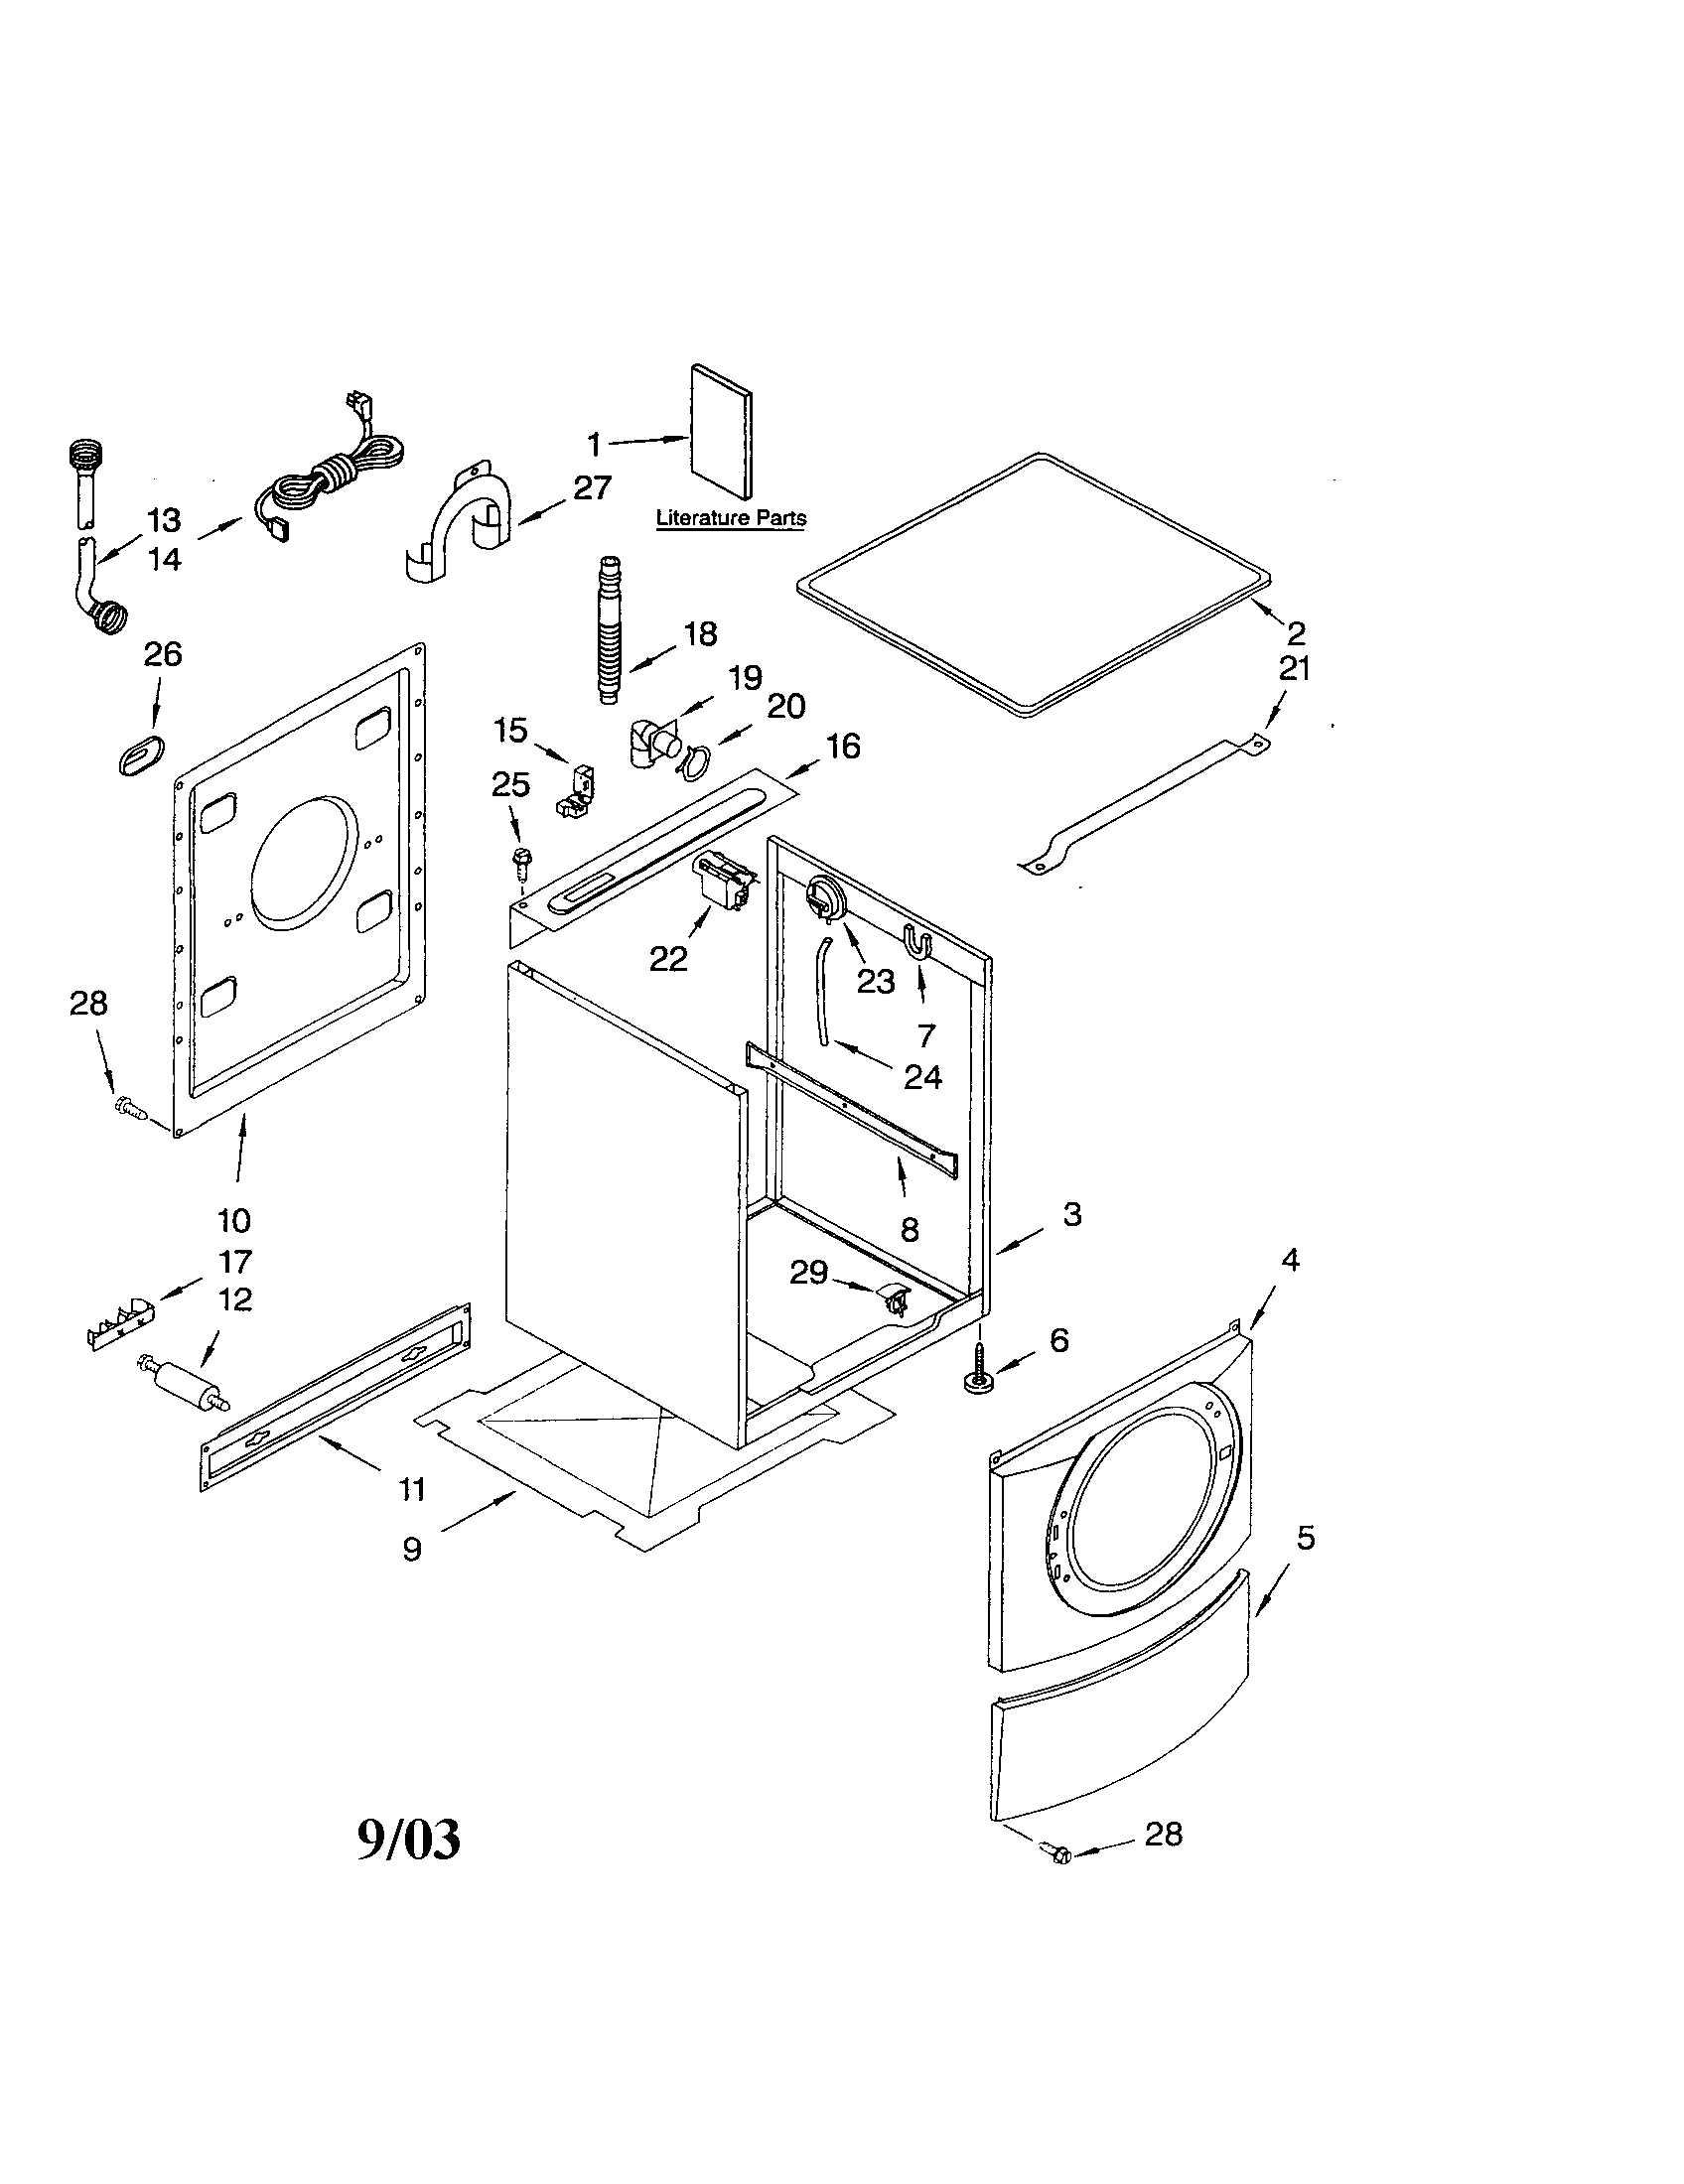 32 Kenmore Washer Model 110 Parts Diagram